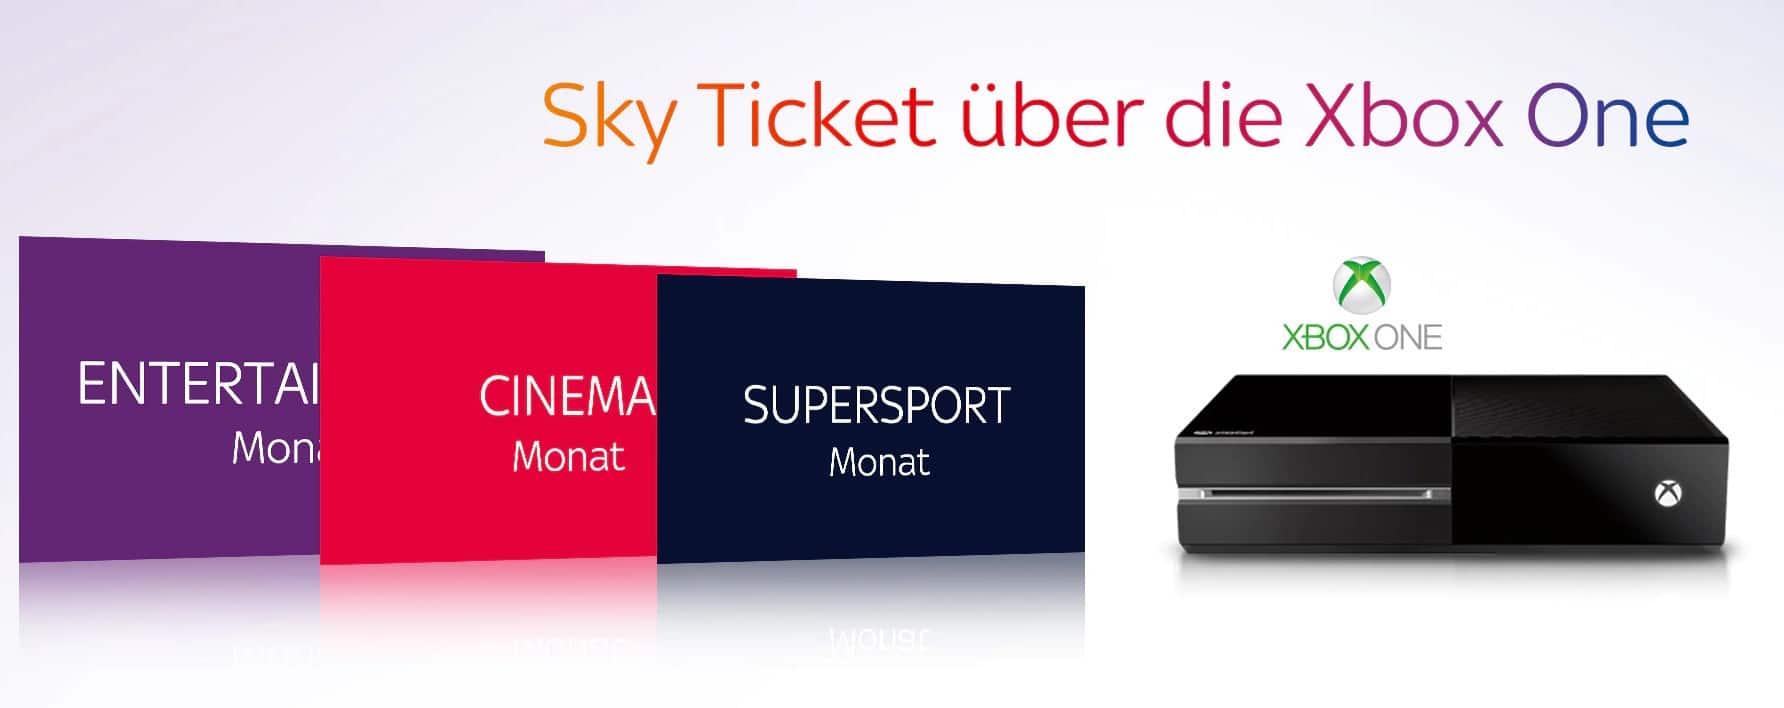 sky-ticket-xbox-one-angebot